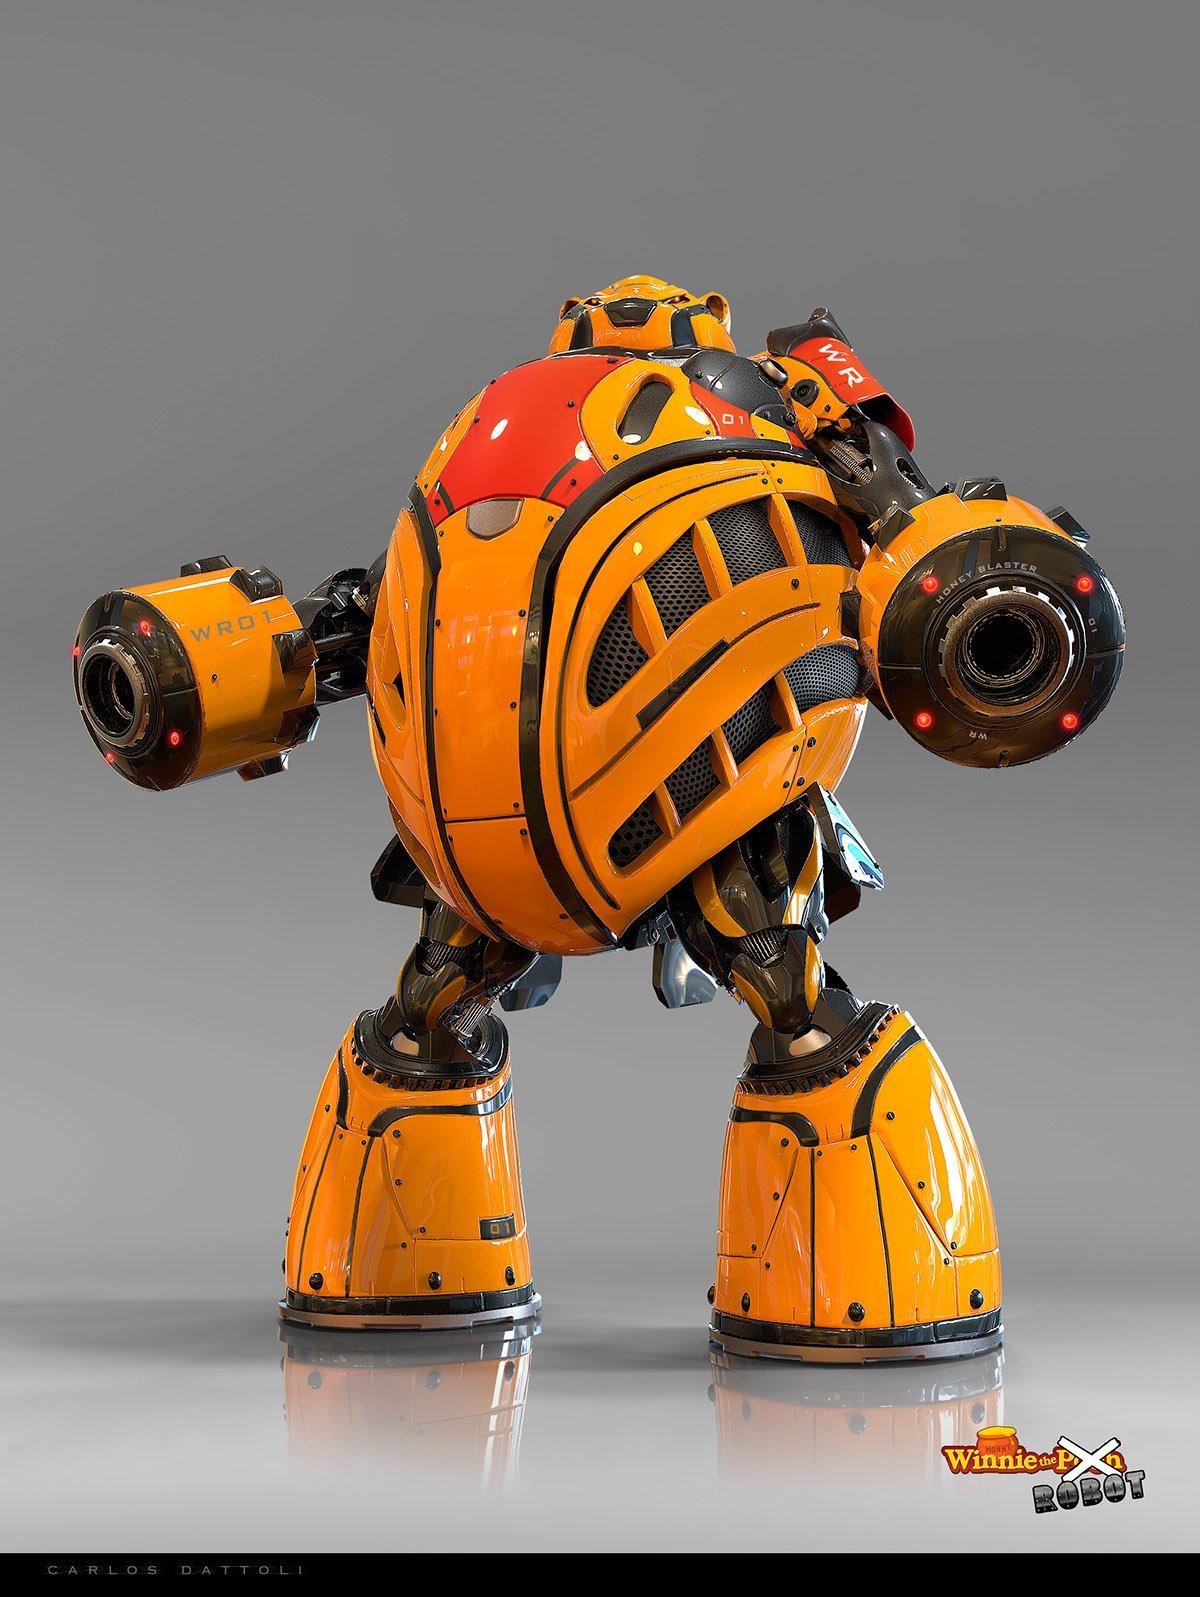 winnie the pooh robots